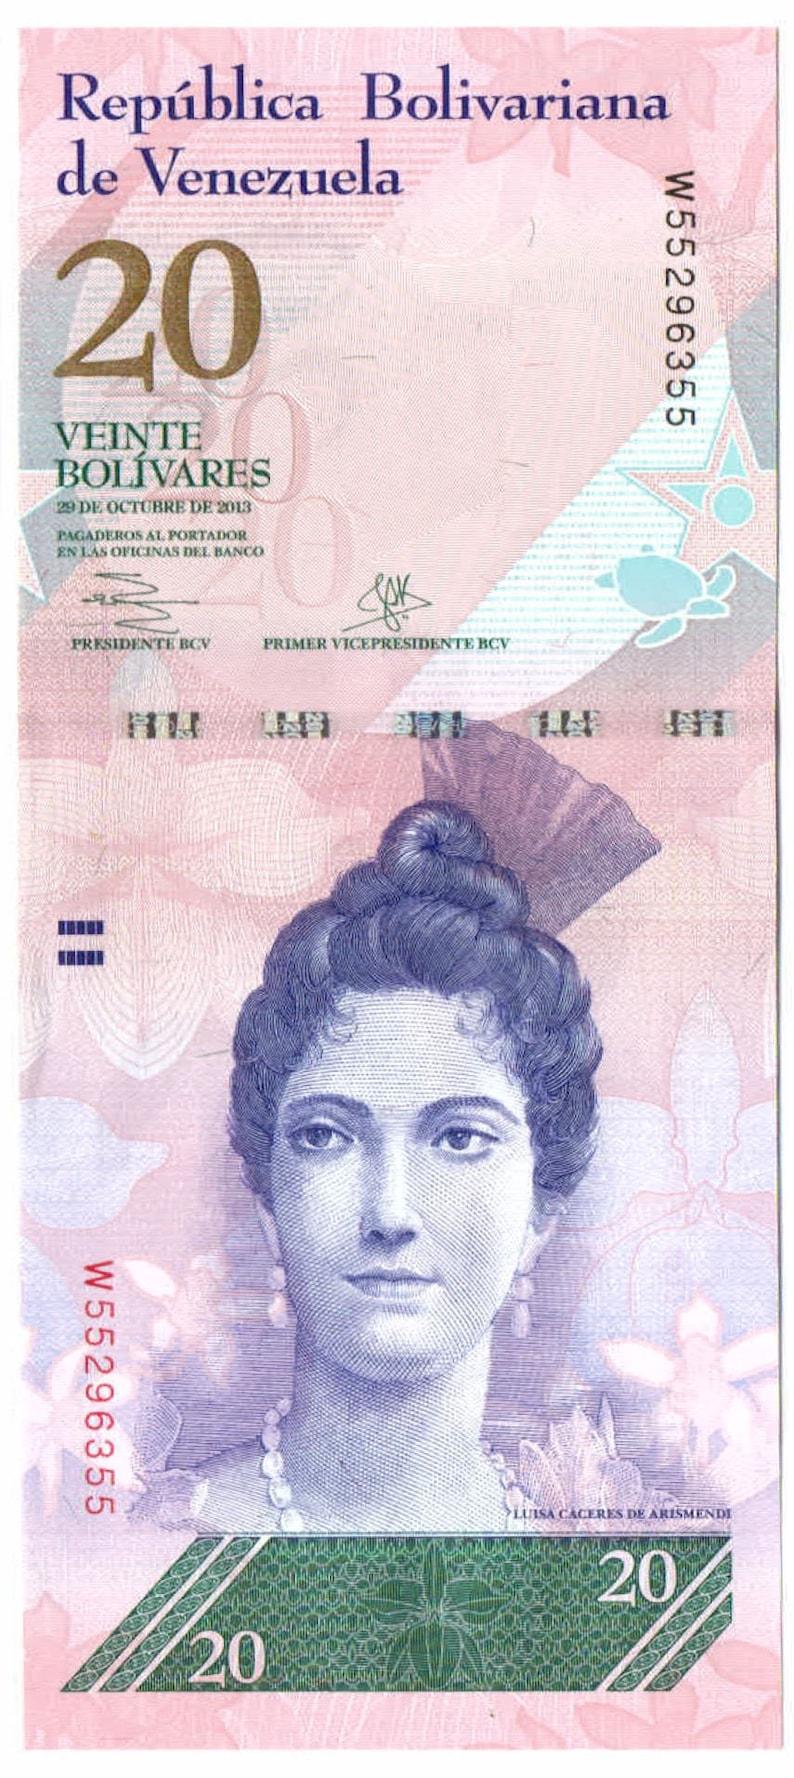 Hawksbill Sea Turtles 20 Bolivares Venezuela Authentic Banknote for Craft Making Luisa C\u00e1ceres de Arismendi